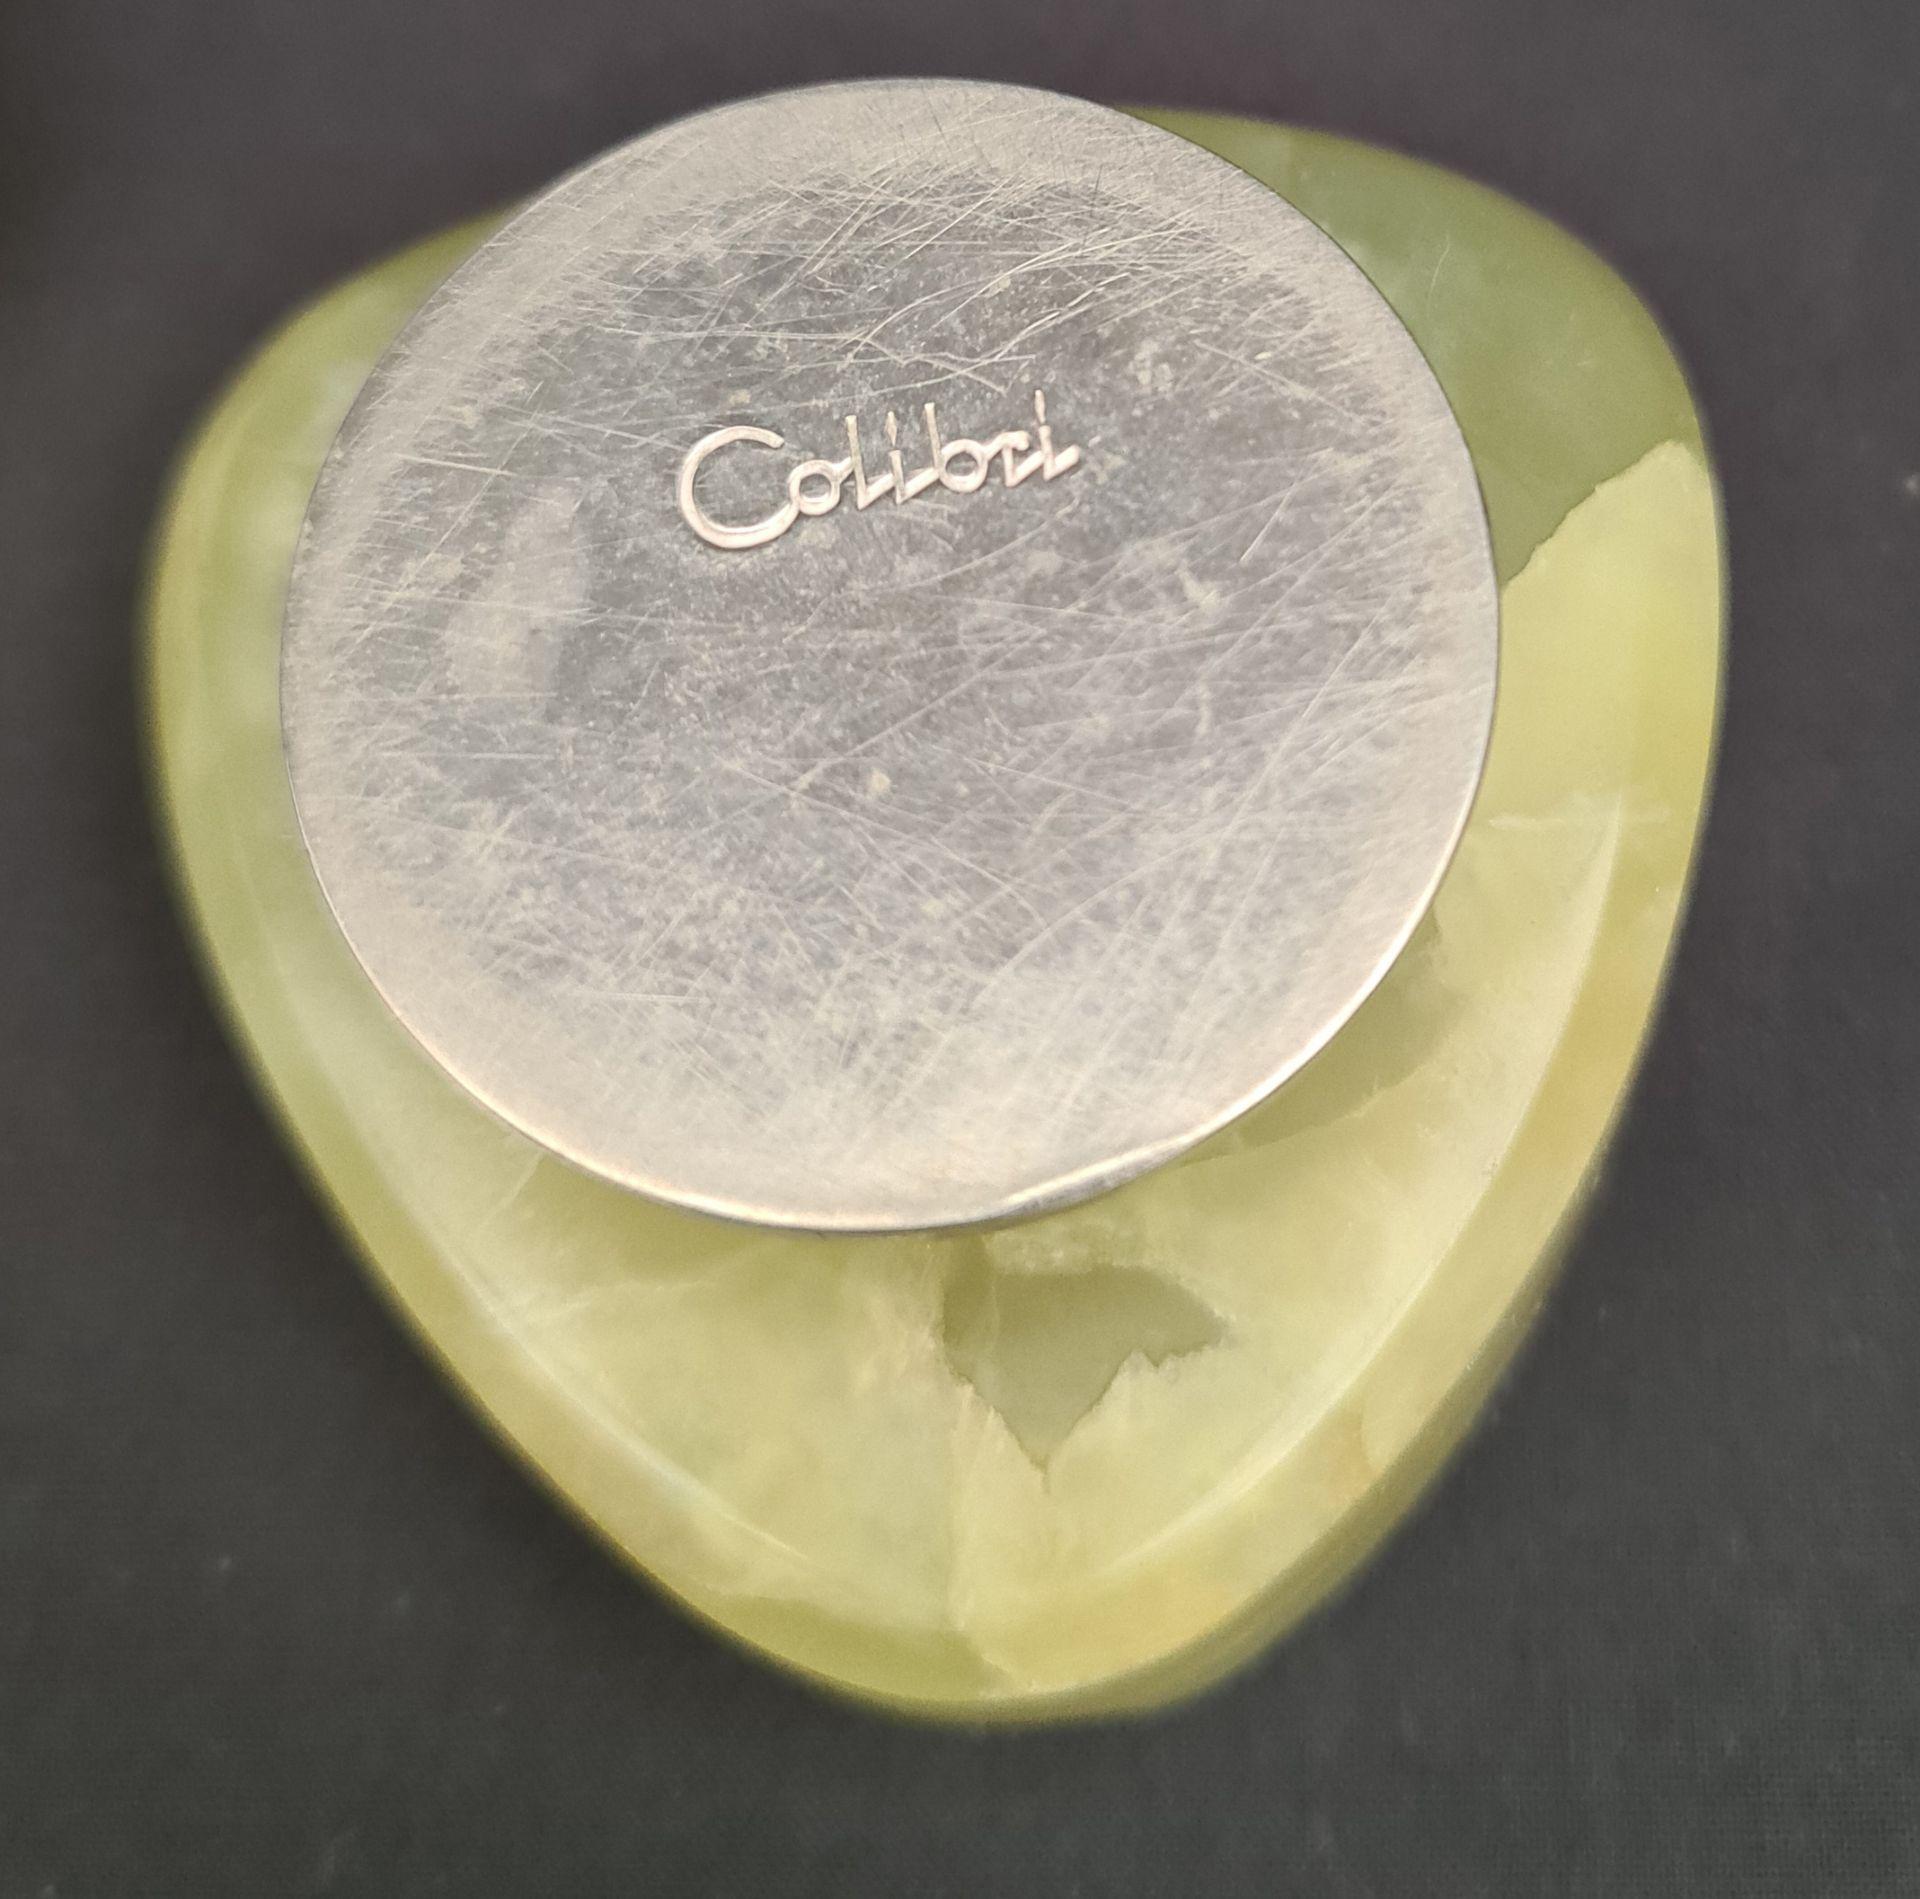 Retro Onyx Calibri Astray & Carved Onyx Turtle - Image 2 of 2